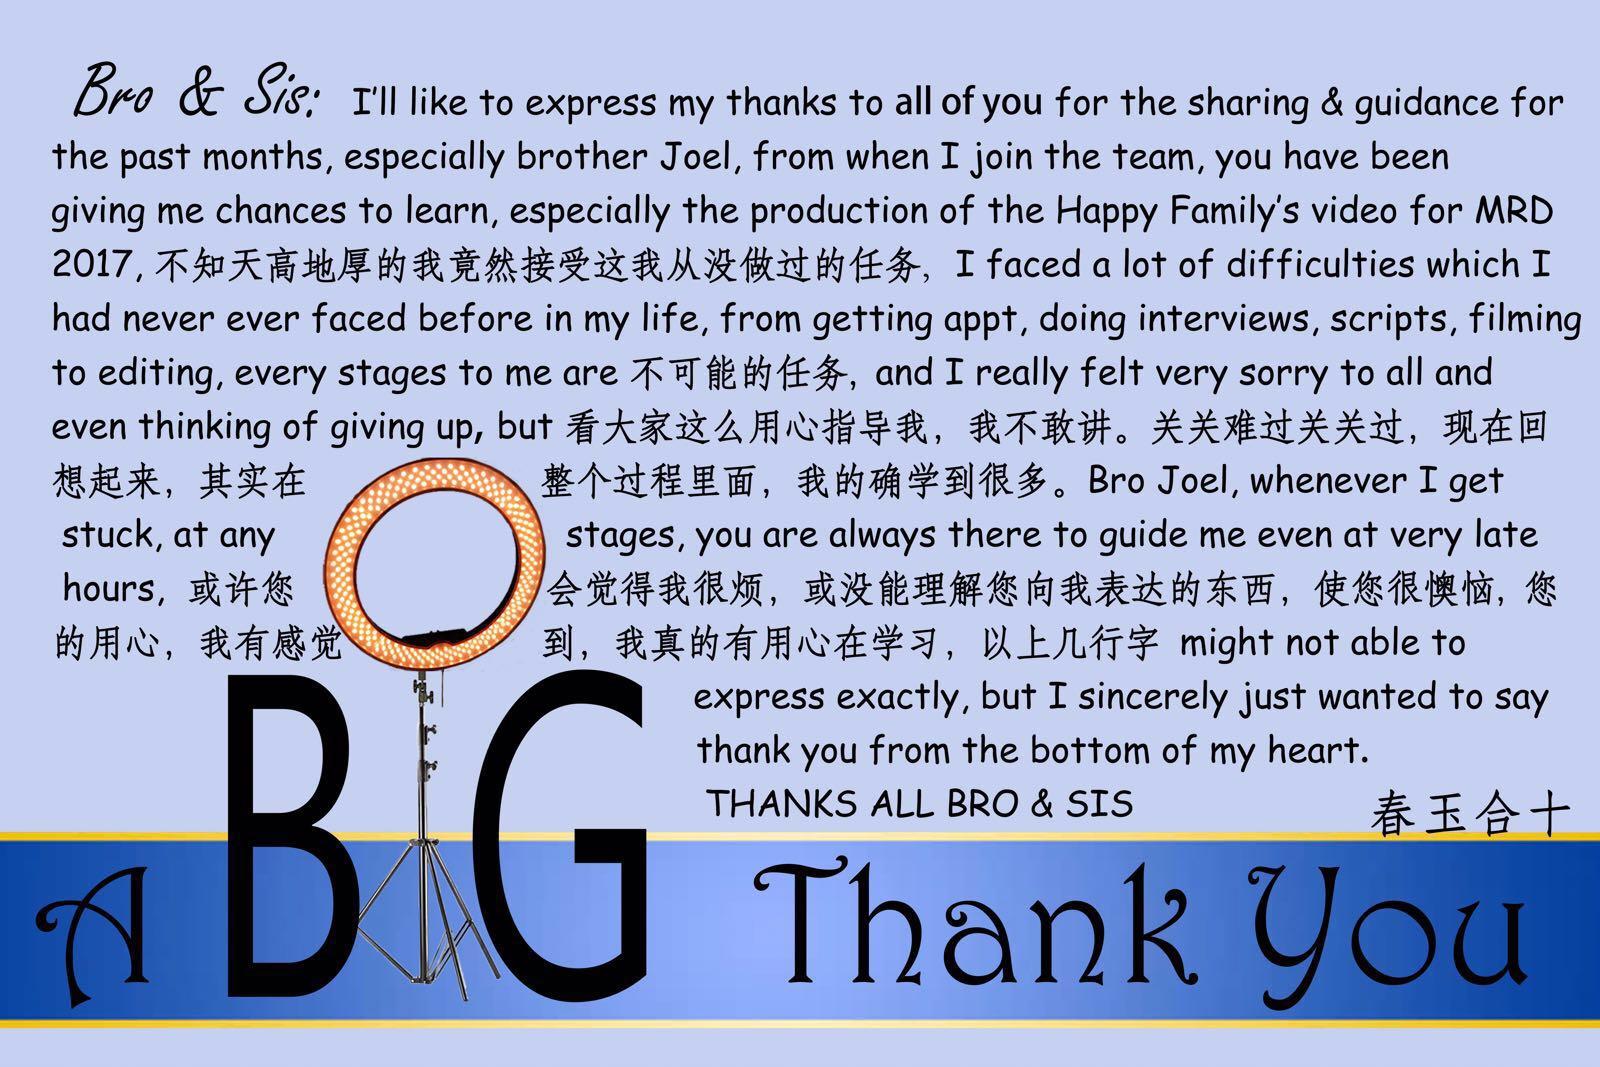 OMAK to all the Video Team members of BWM Media.